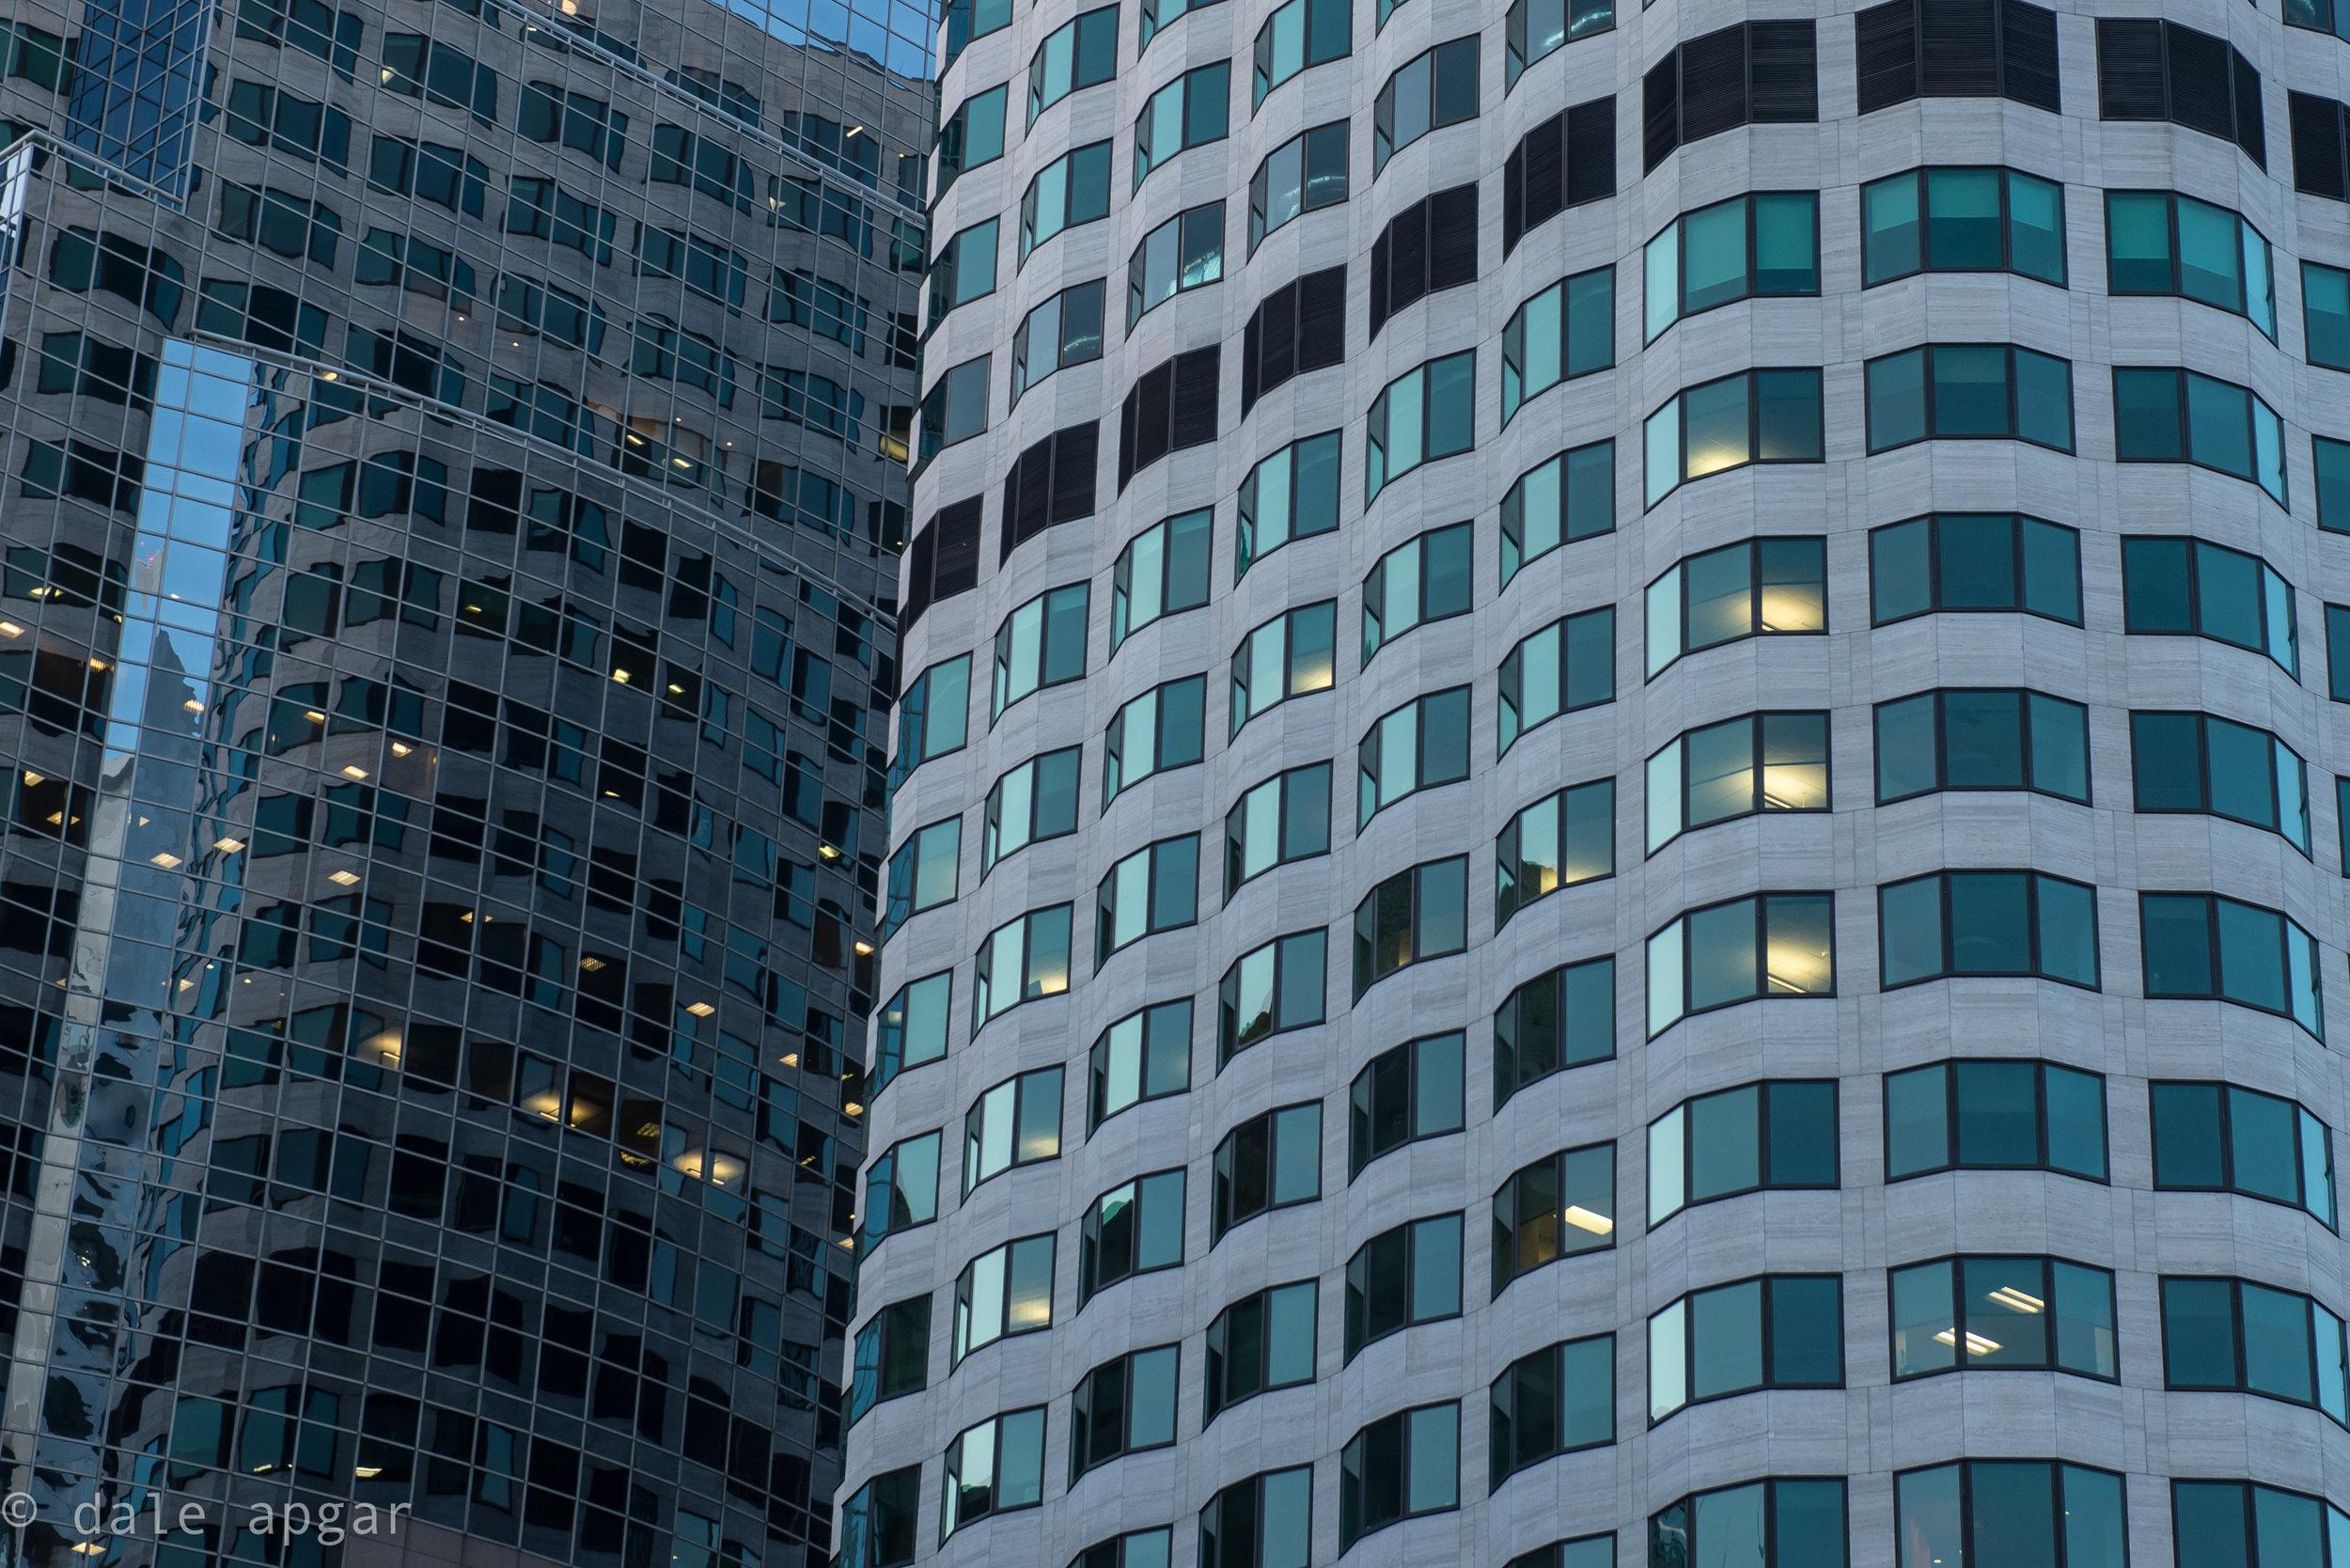 a favorite boston building